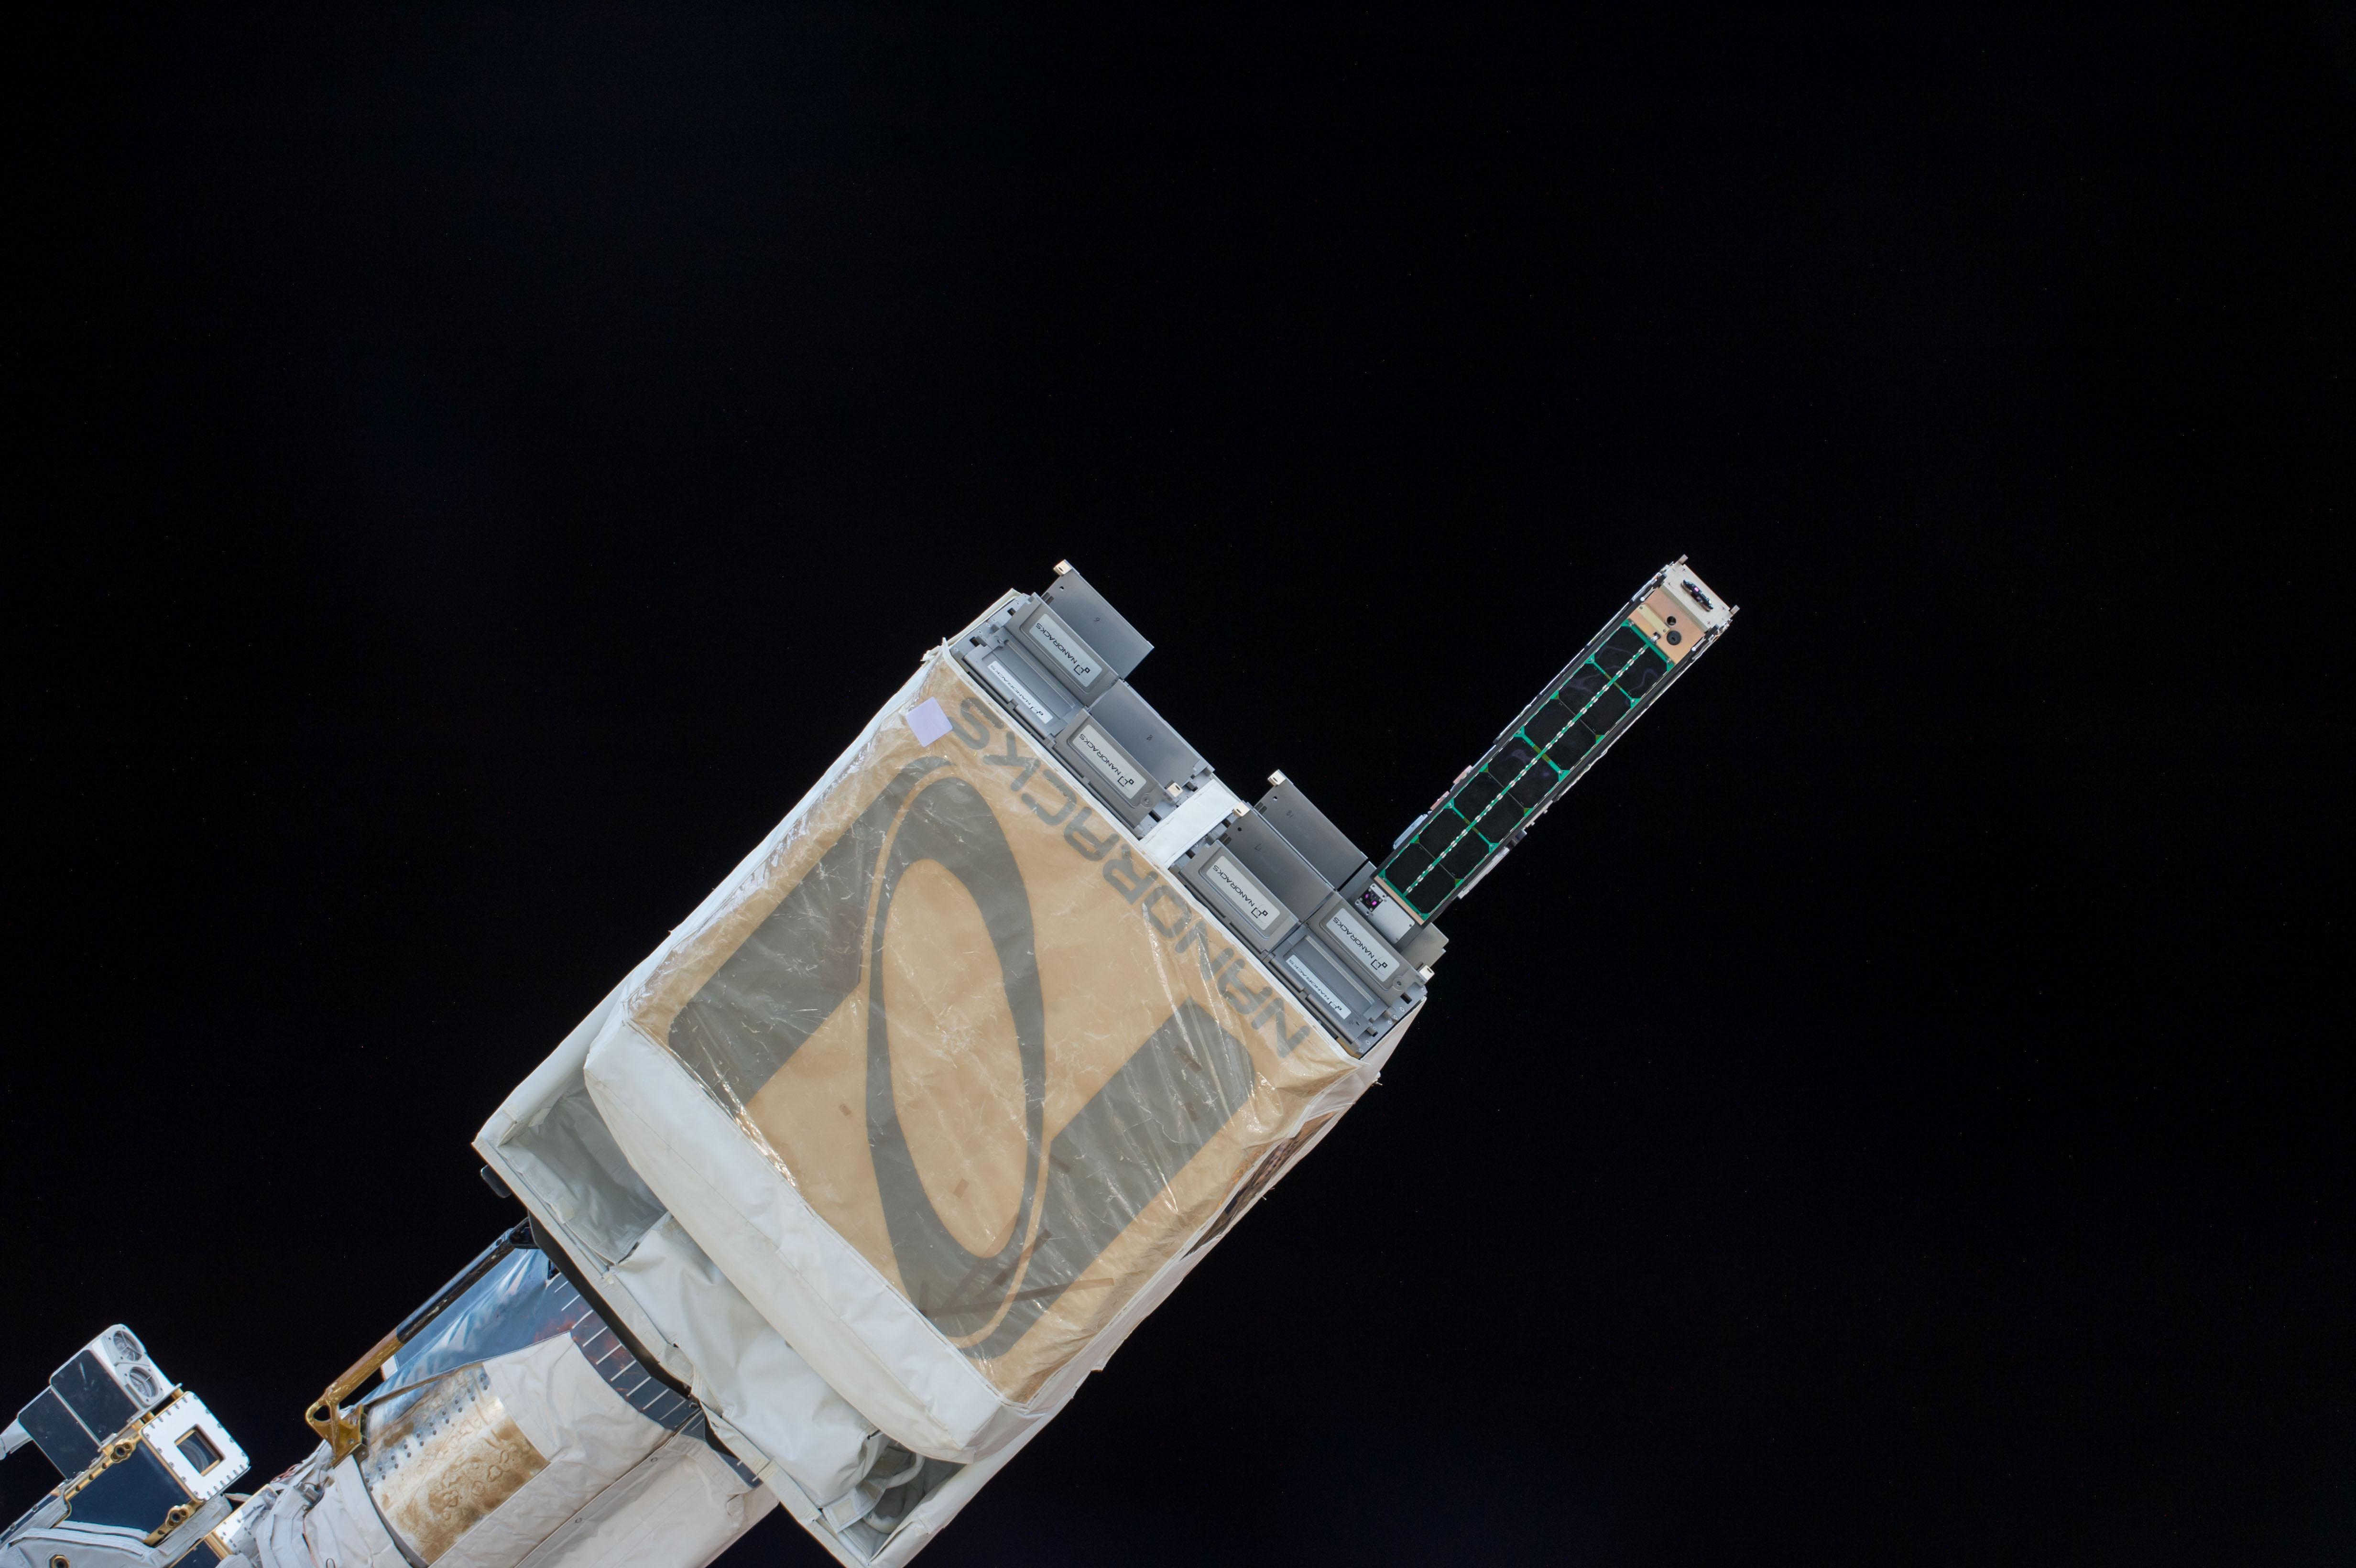 Nanosatellites picture